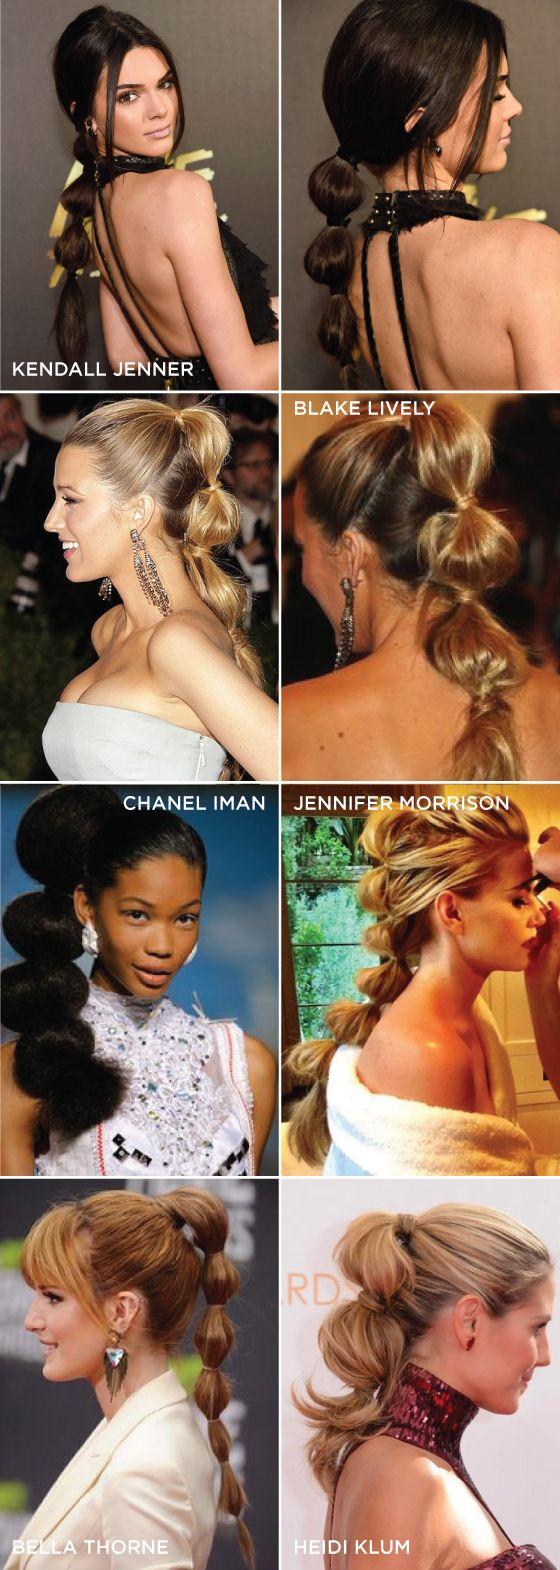 tutorial-diy-bubble-ponytail-rabo-de-cavalo-diferente-penteado-facil-festa-preso-cabelo-hair-blake-lively-kendal-jenner-kardashian